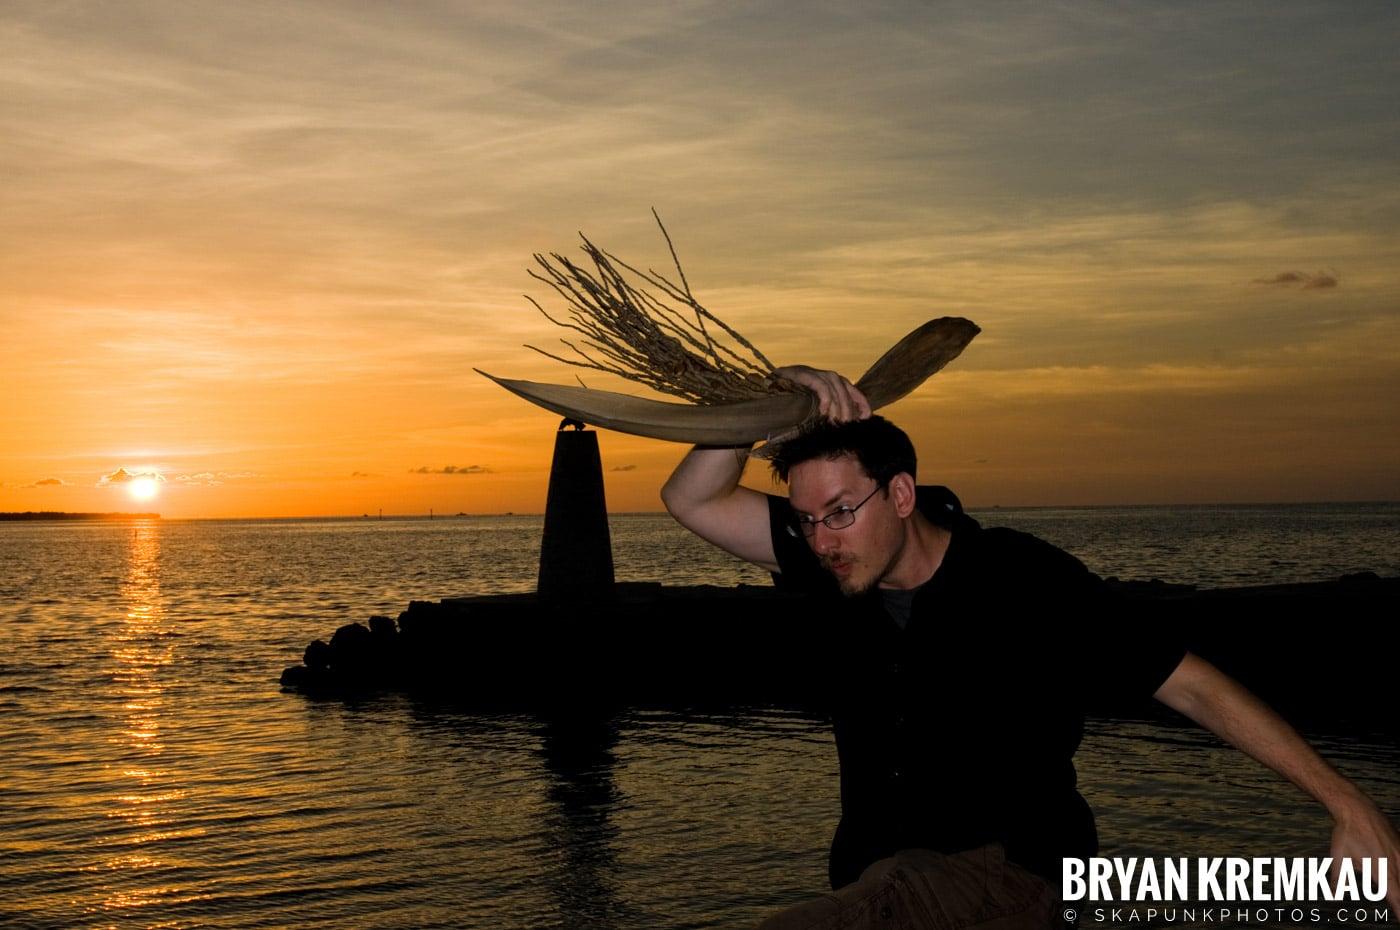 Florida Keys Vacation - 7.09.10 - 7.15.10 (52)